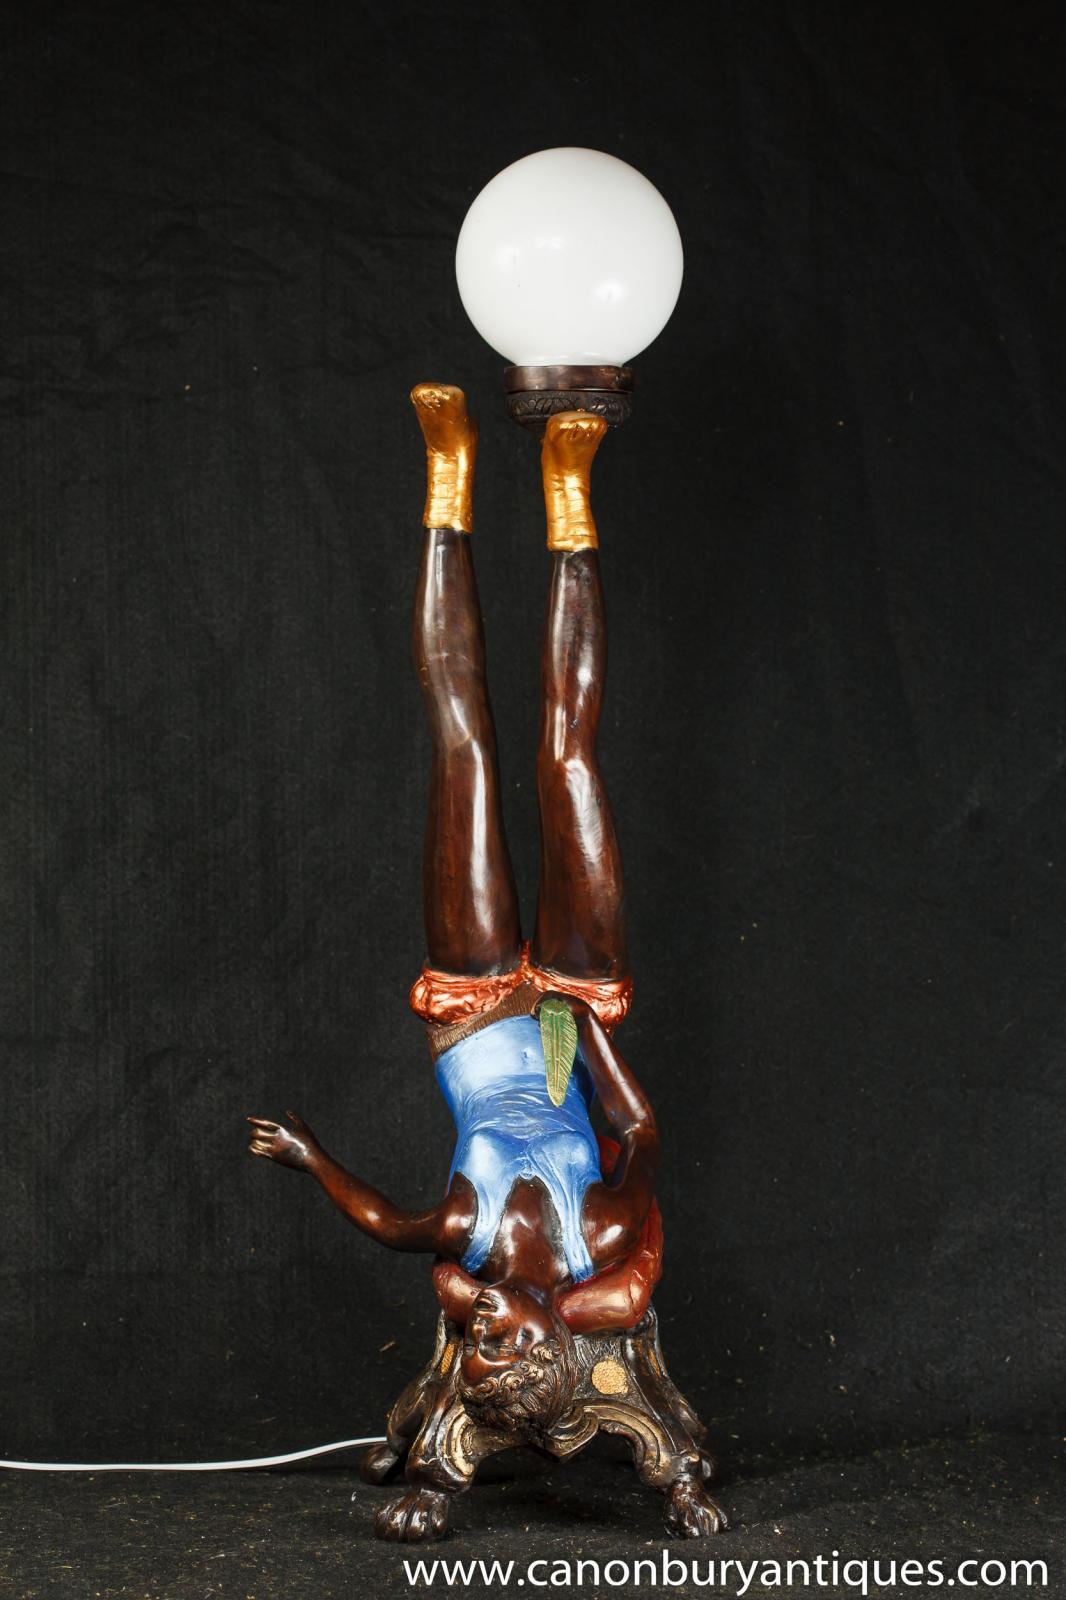 New Orleans Burlesque Figurine Bronze Lamp Statue Erotic  : New20Orleans20Burlesque20Figurine20Bronze20Lamp20Statue20Erotic20Kitsch20Art 1387402577 zoom 55 from www.ebay.com size 1066 x 1600 jpeg 146kB